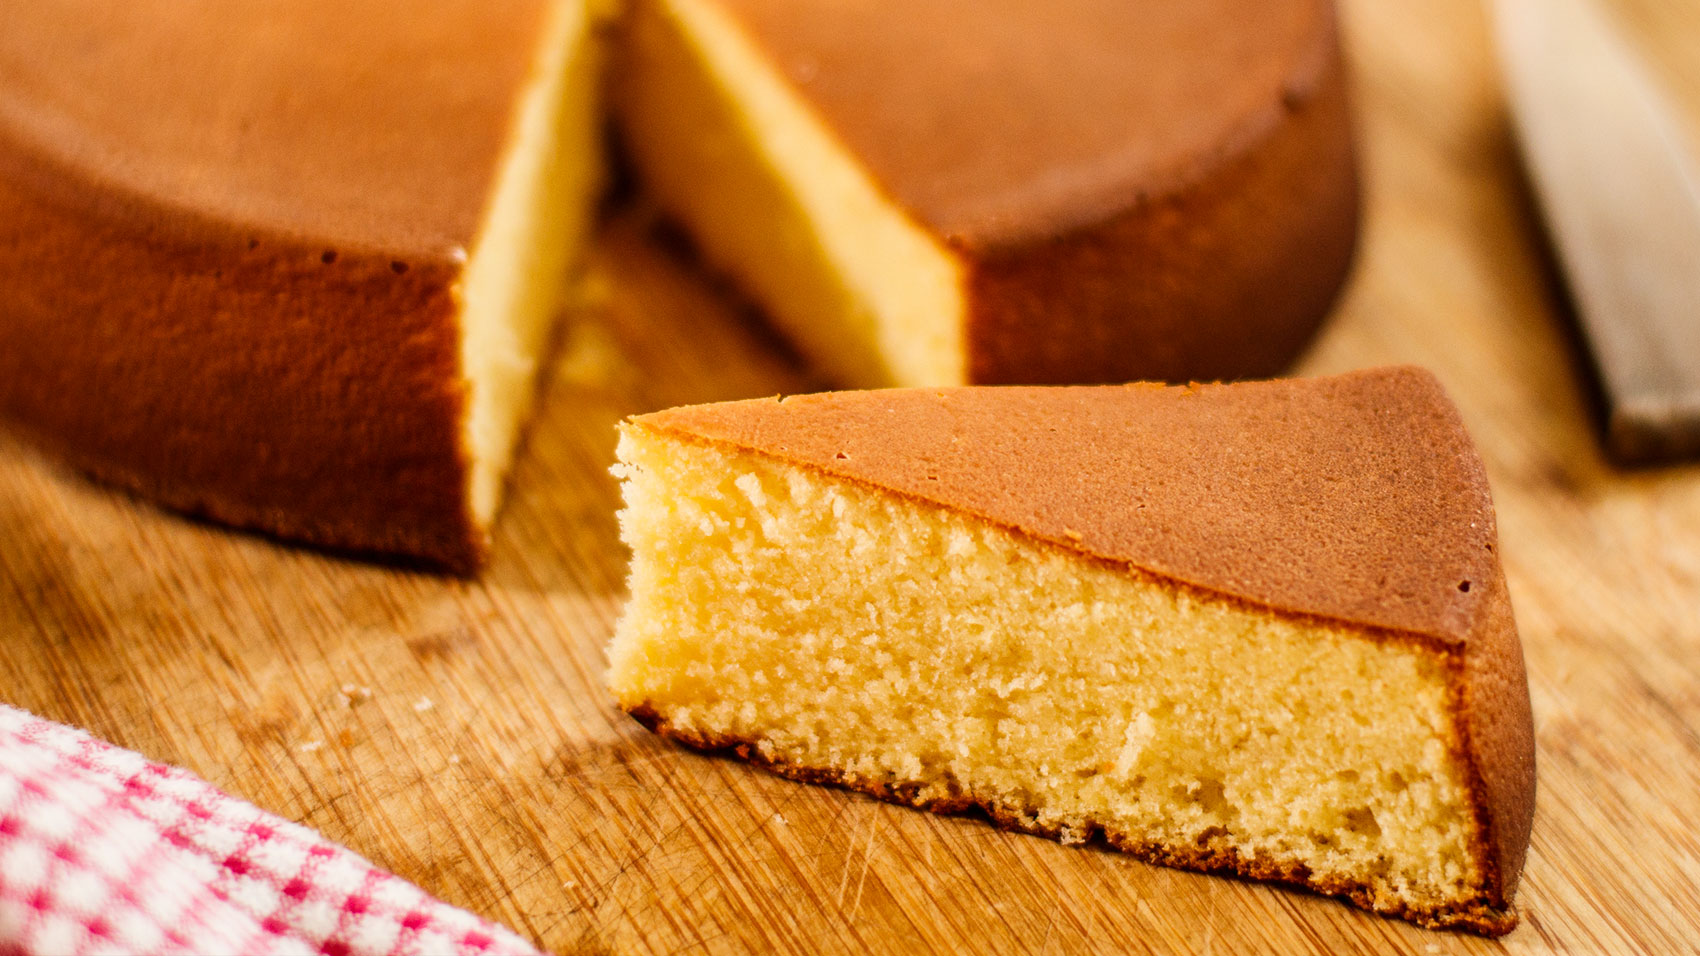 Classic Genoise Vanilla Sponge Cake Recipe